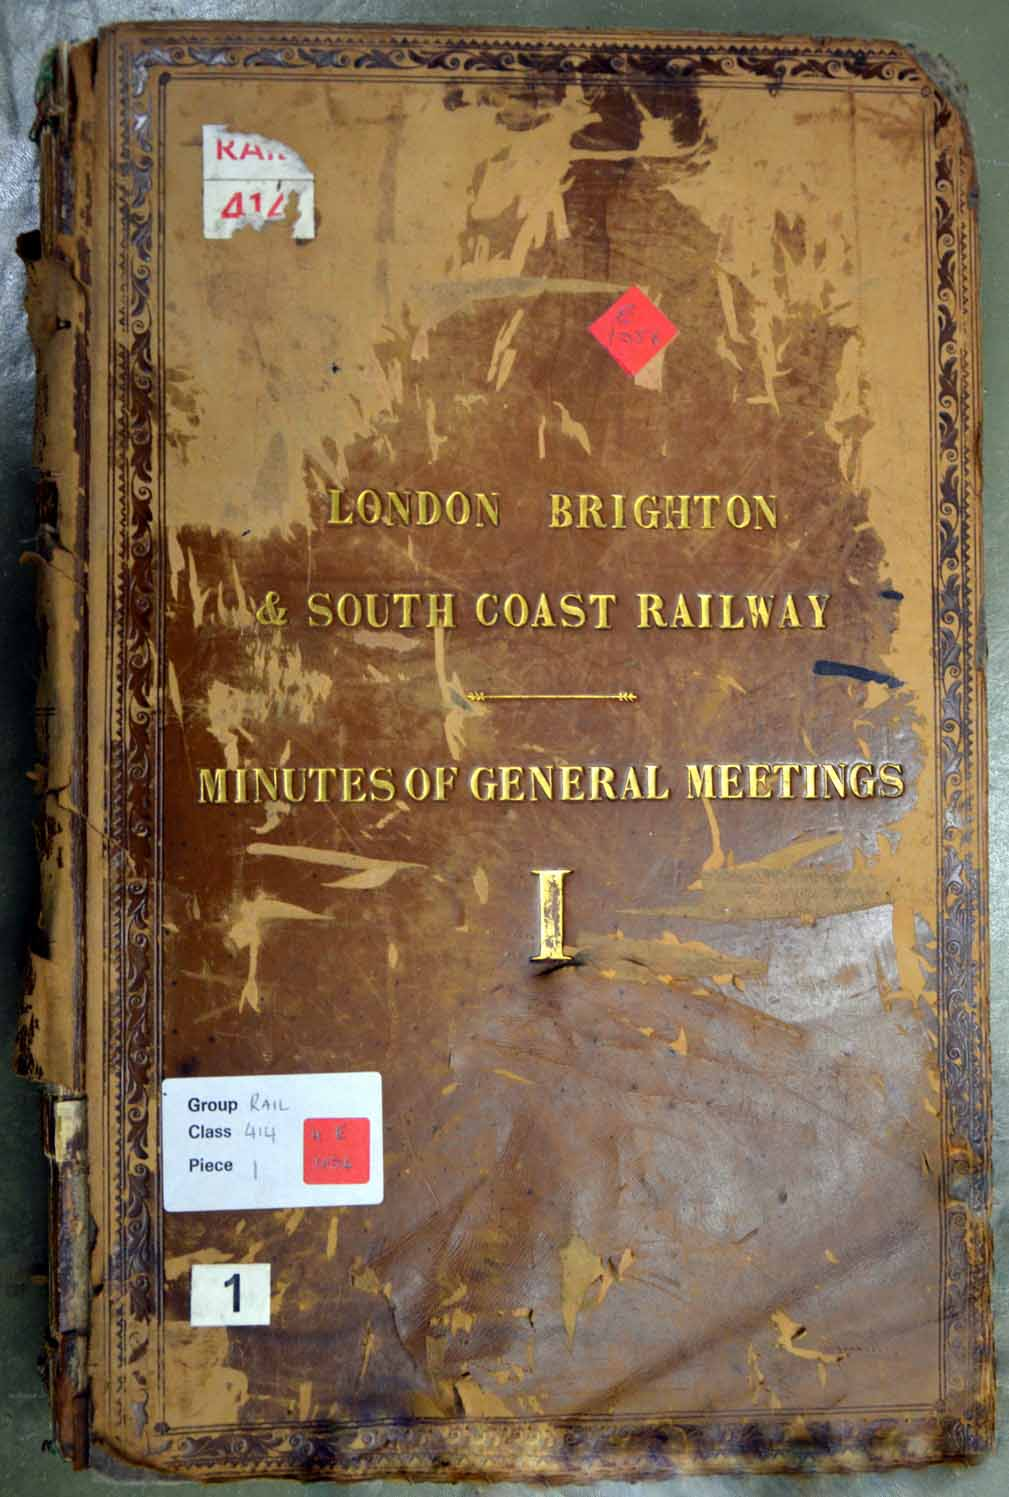 South Coast Railway, catalogue reference RAIL 414/1.